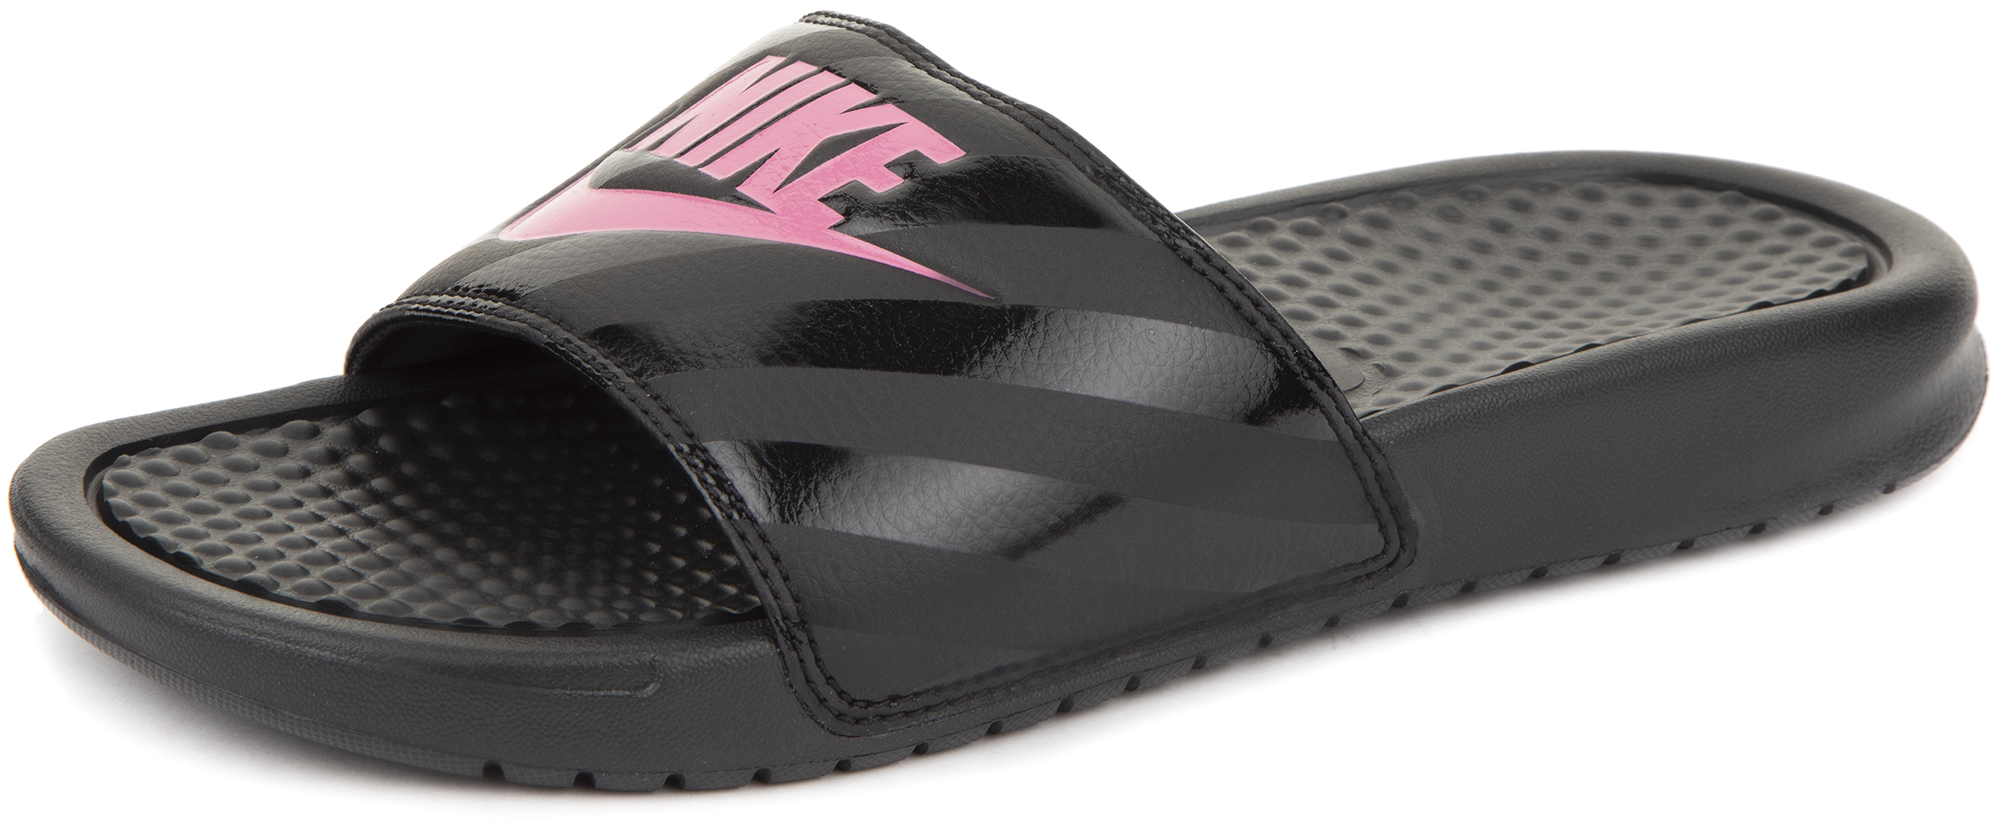 Nike Шлепанцы женские Nike Benassi Just Do It, размер 39,5 цена